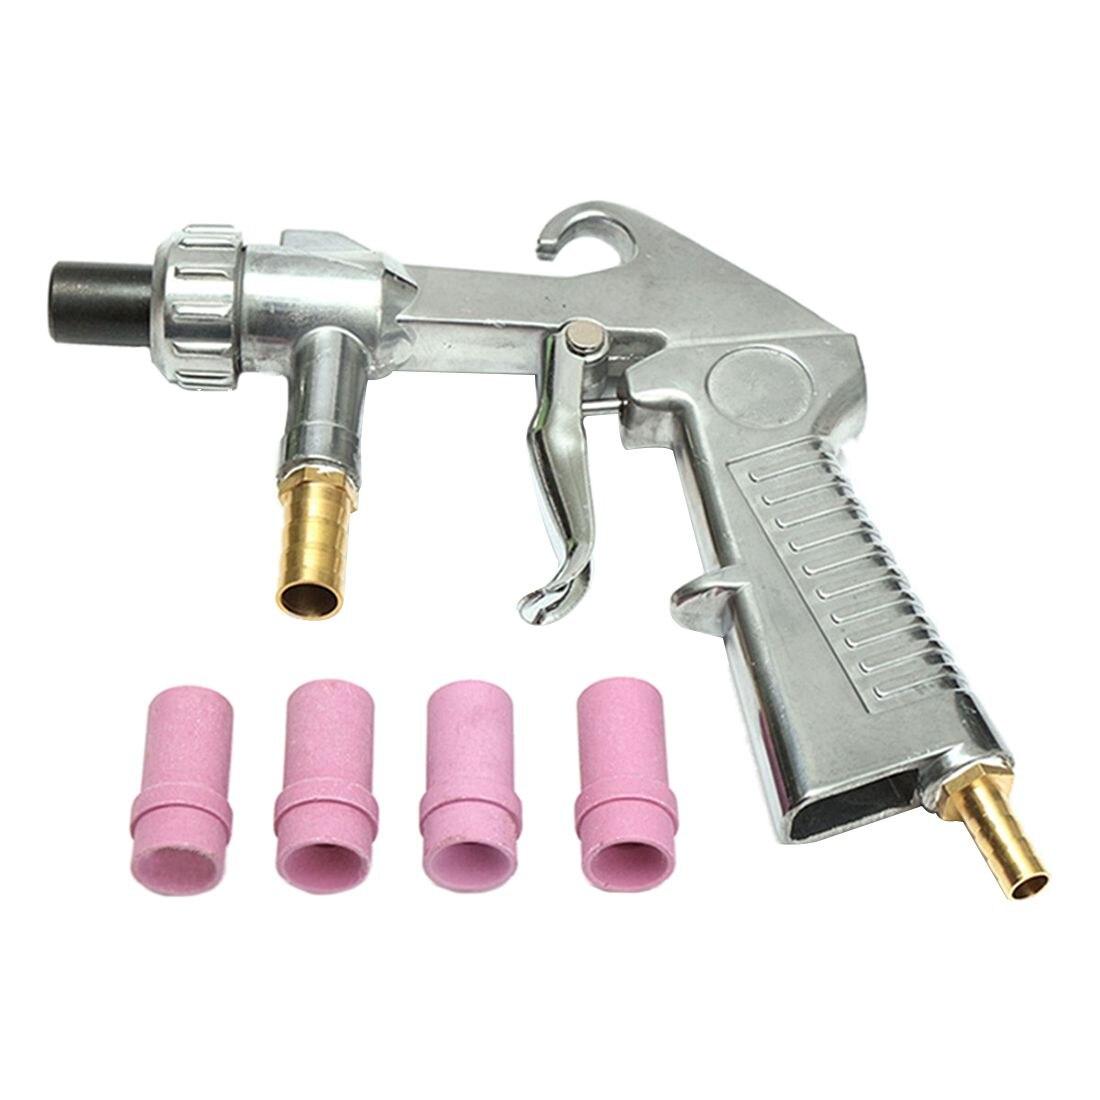 Sandblaster Gun Air Siphon + 4pcs Ceramic Nozzles Abrasive 4.5mm/5mm/6mm/7mm Set